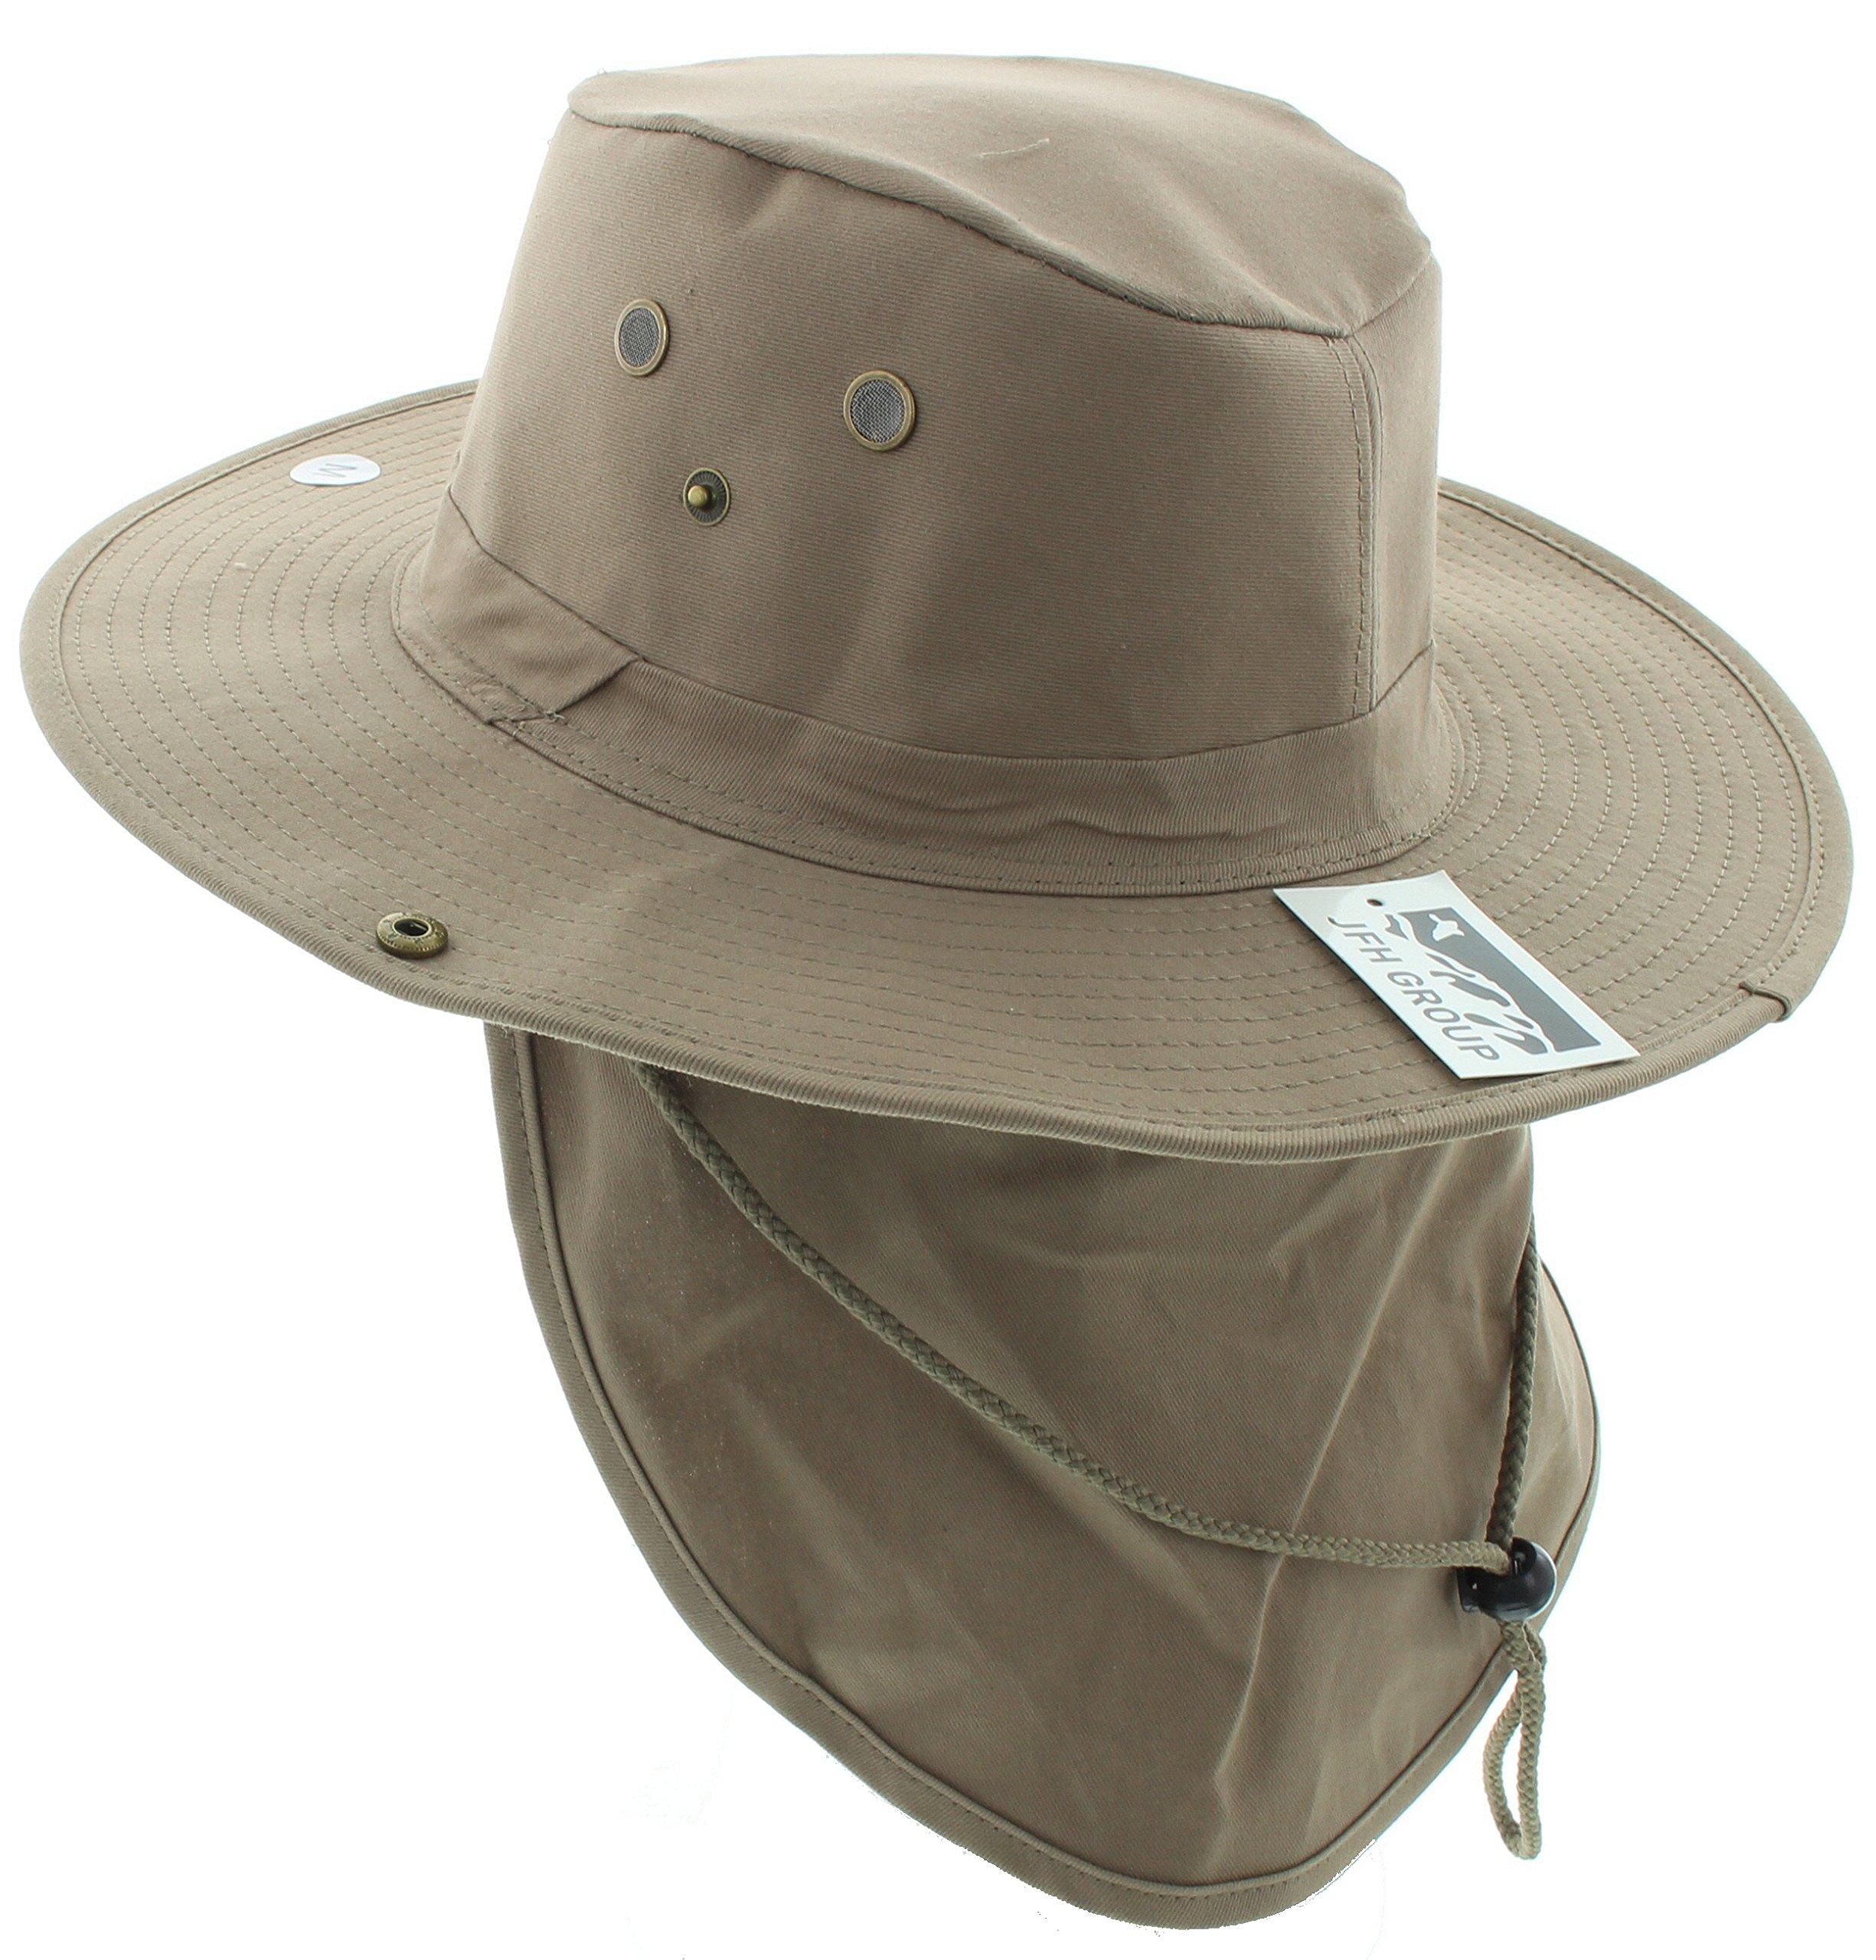 89b68b8b03f JFH Wide Brim Bora Booney Outdoor Safari Summer Hat w Neck Flap   Sun  Protection